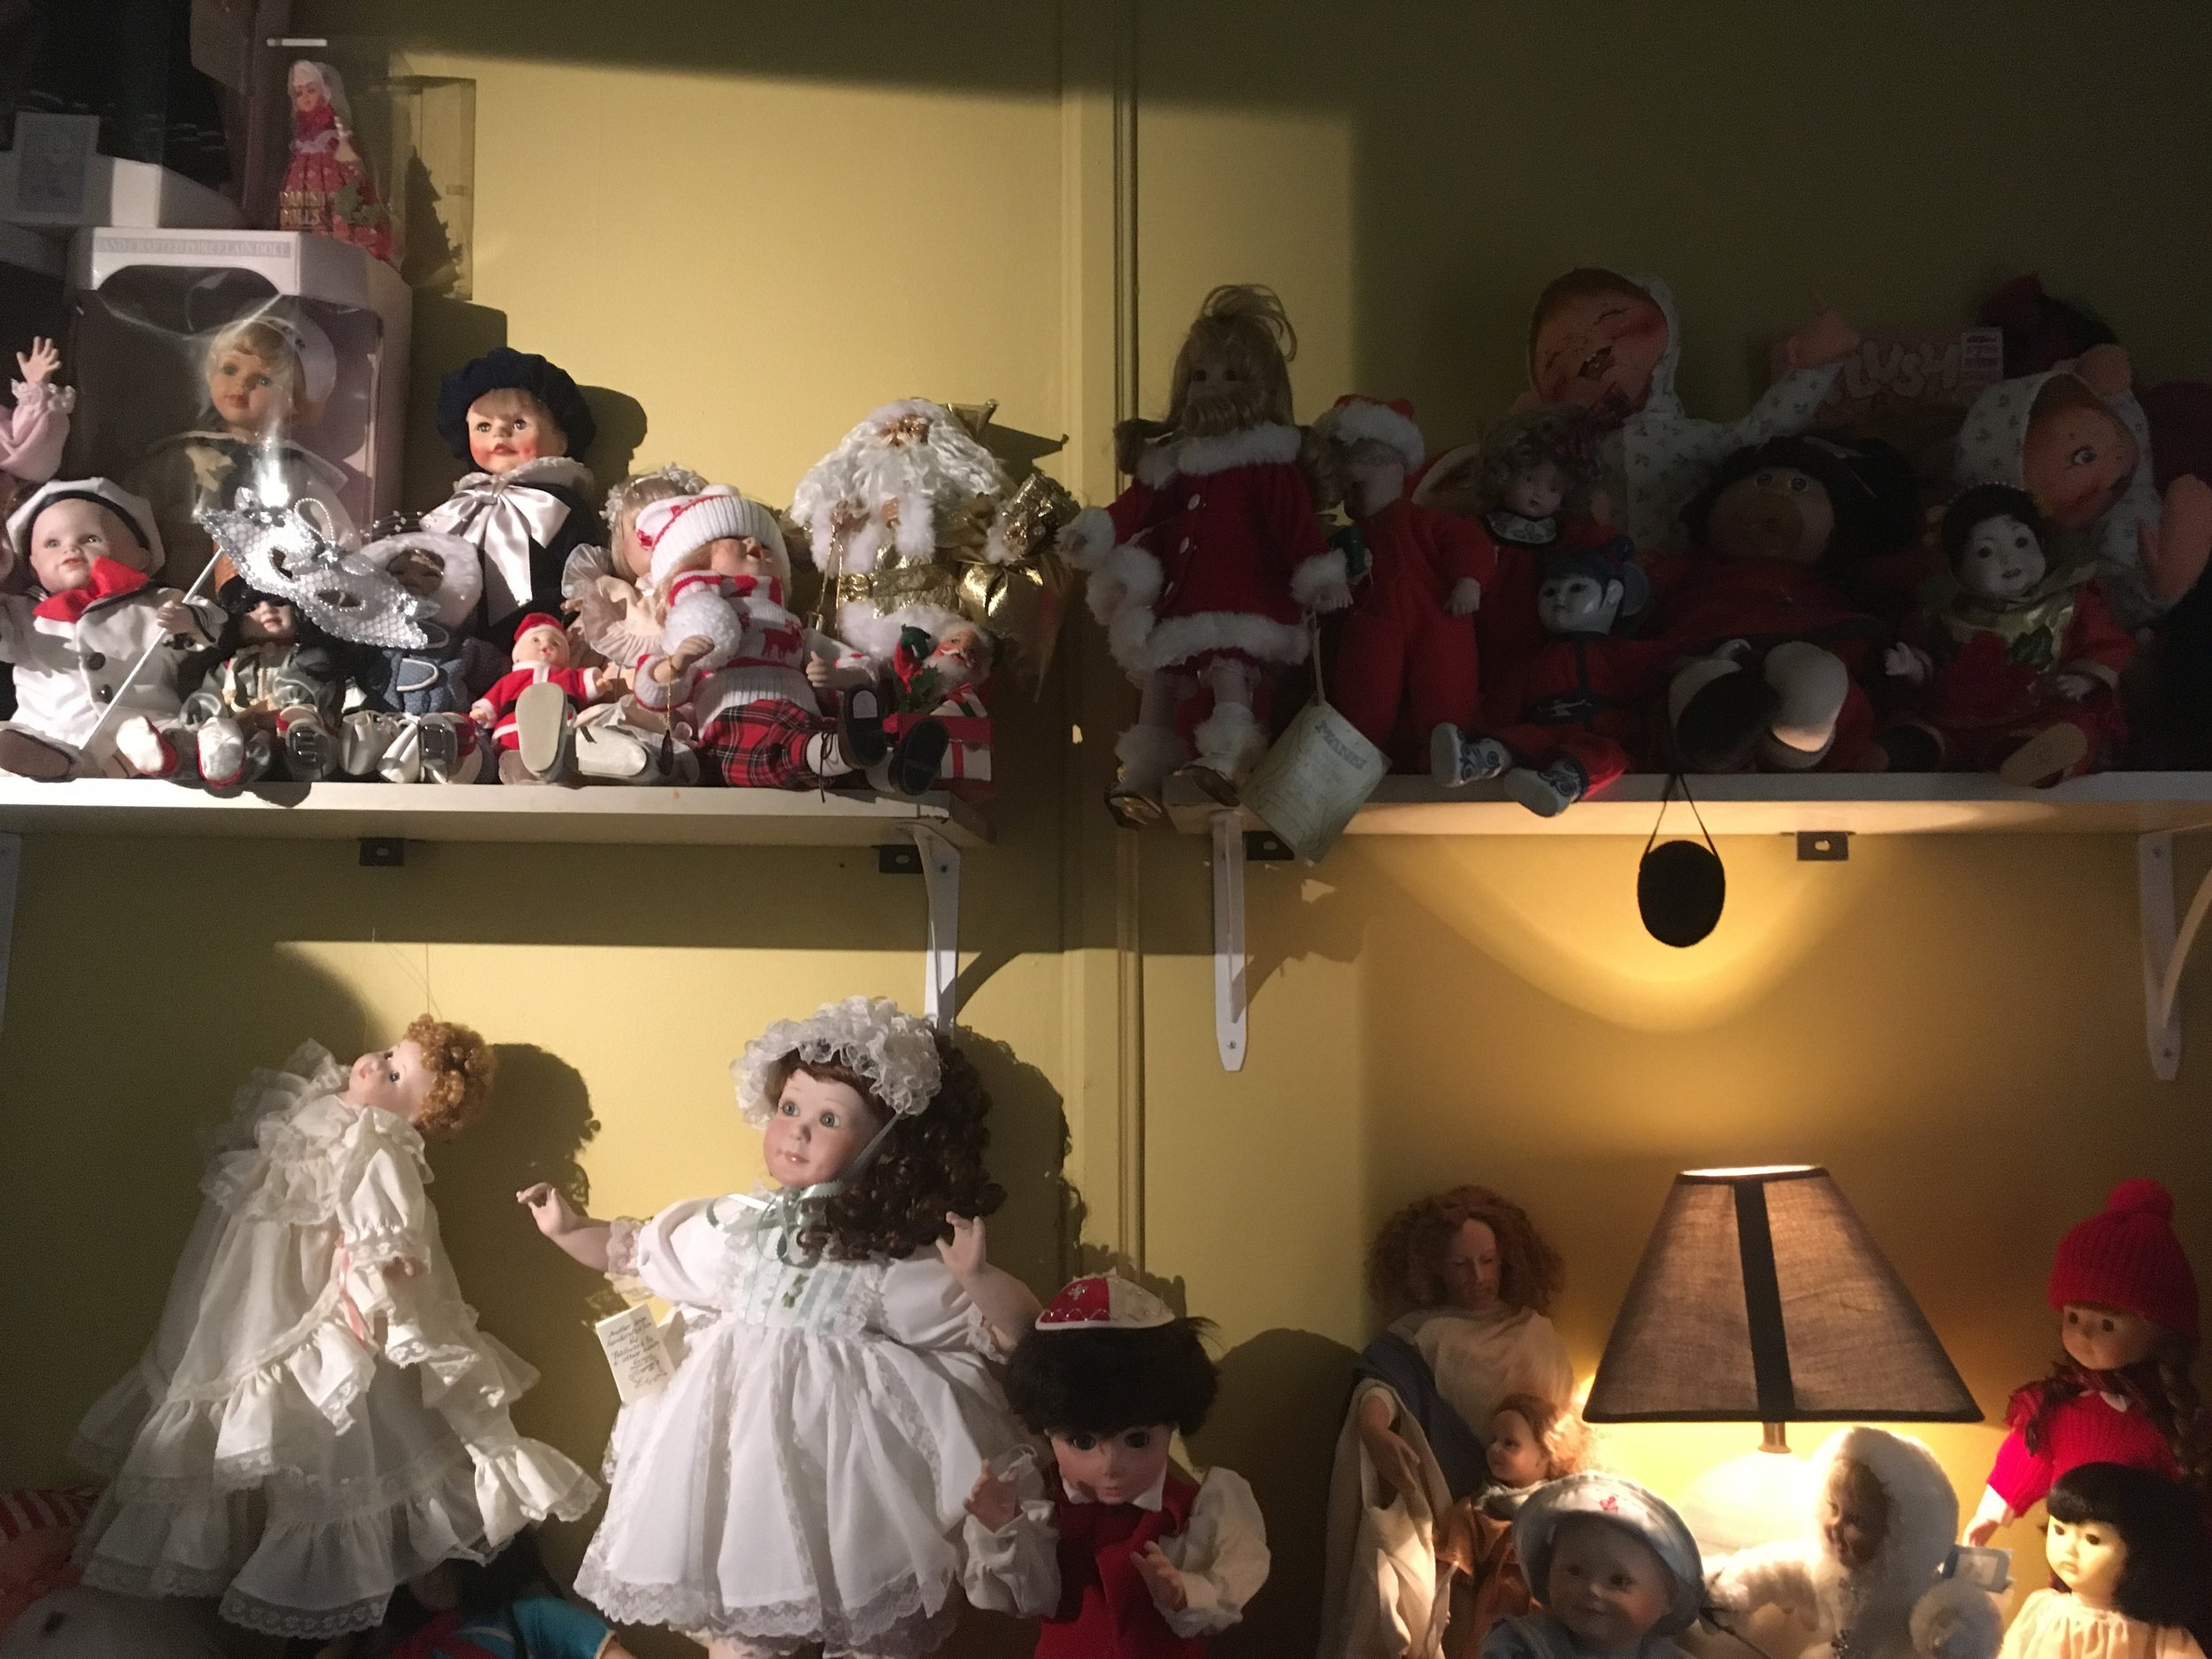 Doll details